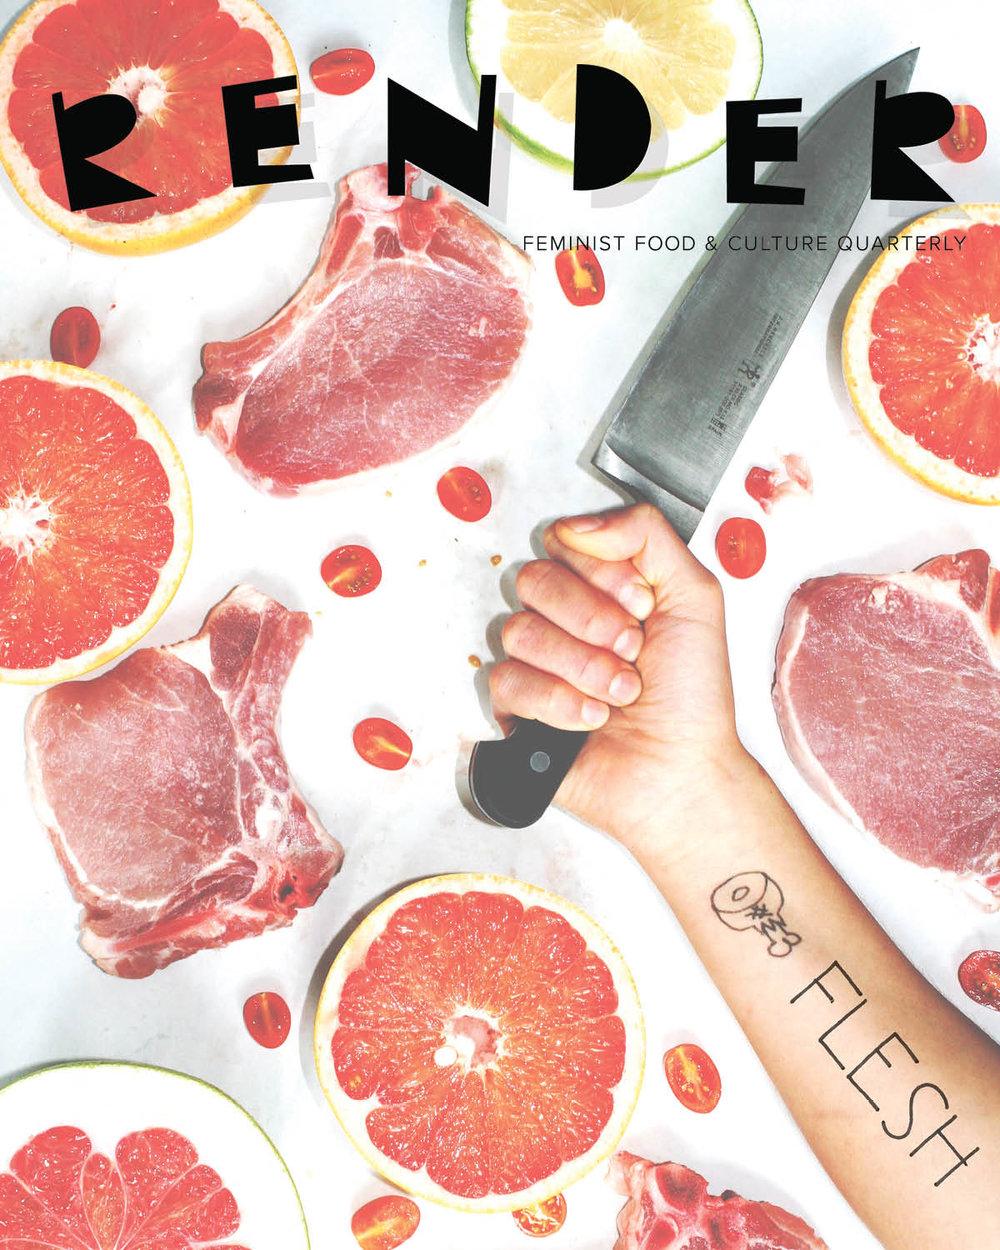 RENDER_cover.jpg